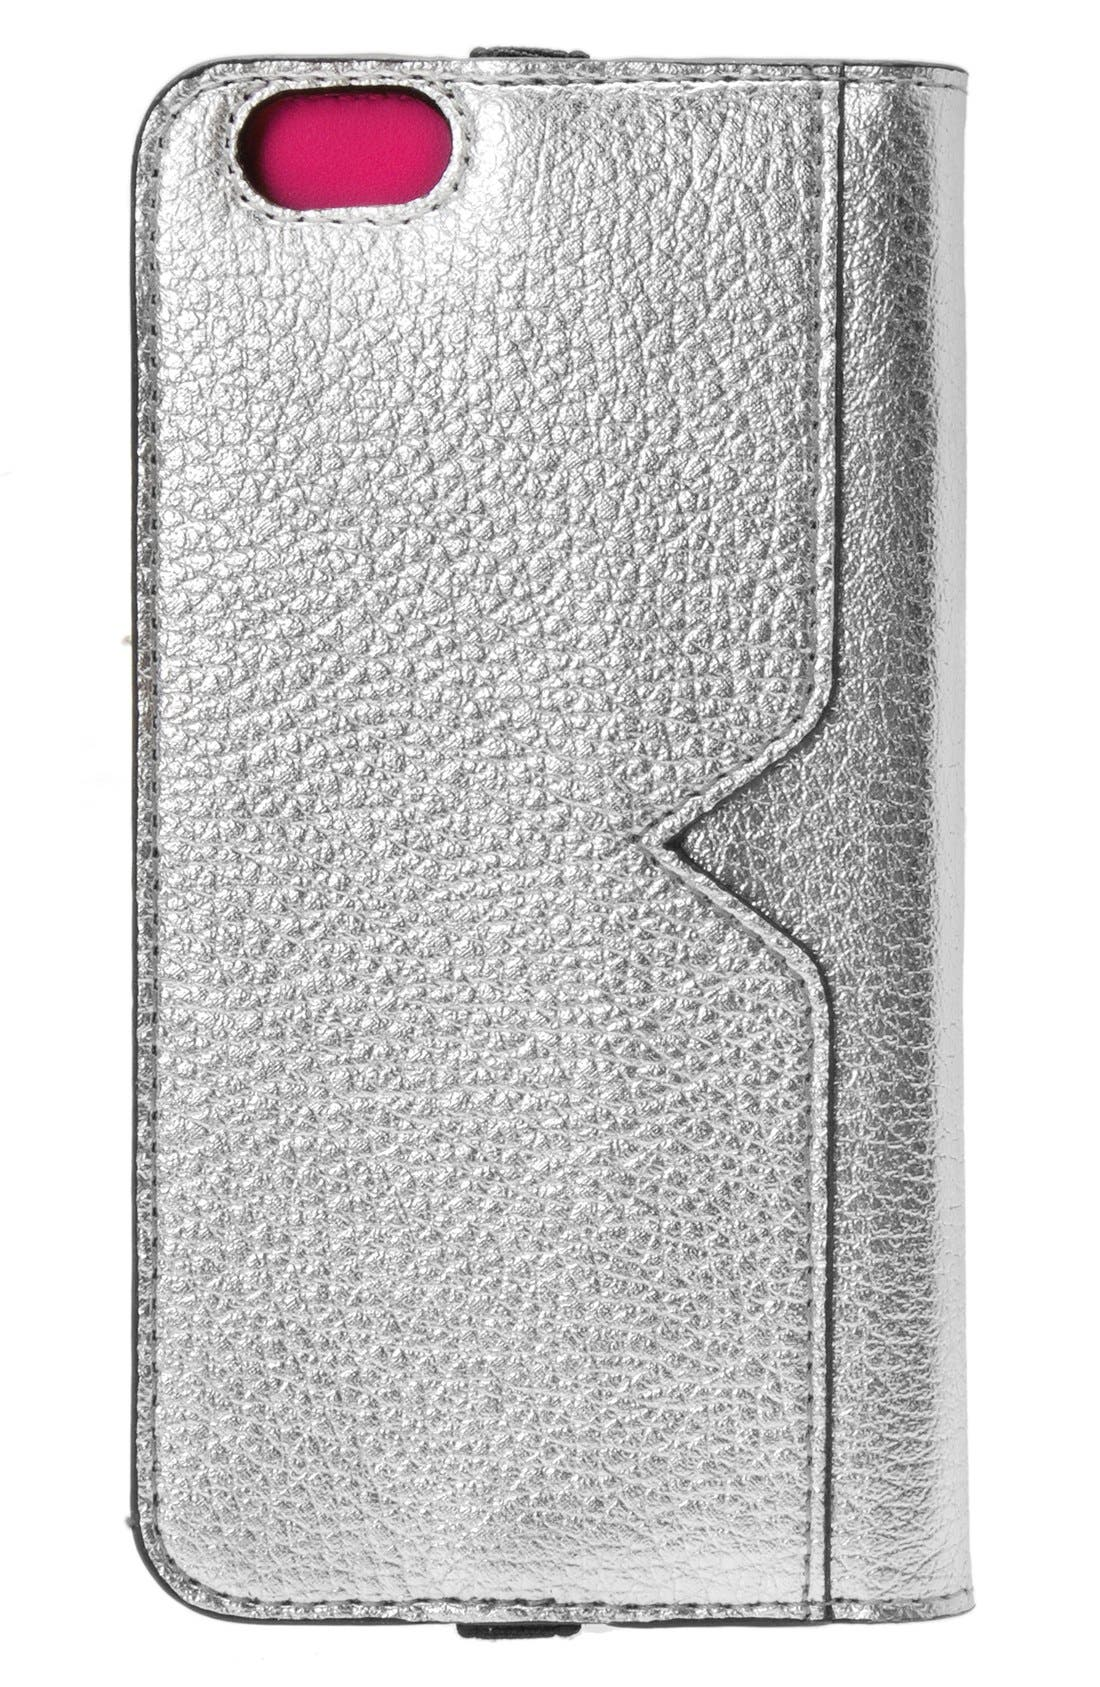 iPhone 6/6s Metallic Leather Wallet Case,                             Alternate thumbnail 2, color,                             Metallic Silver/ Fuchsia